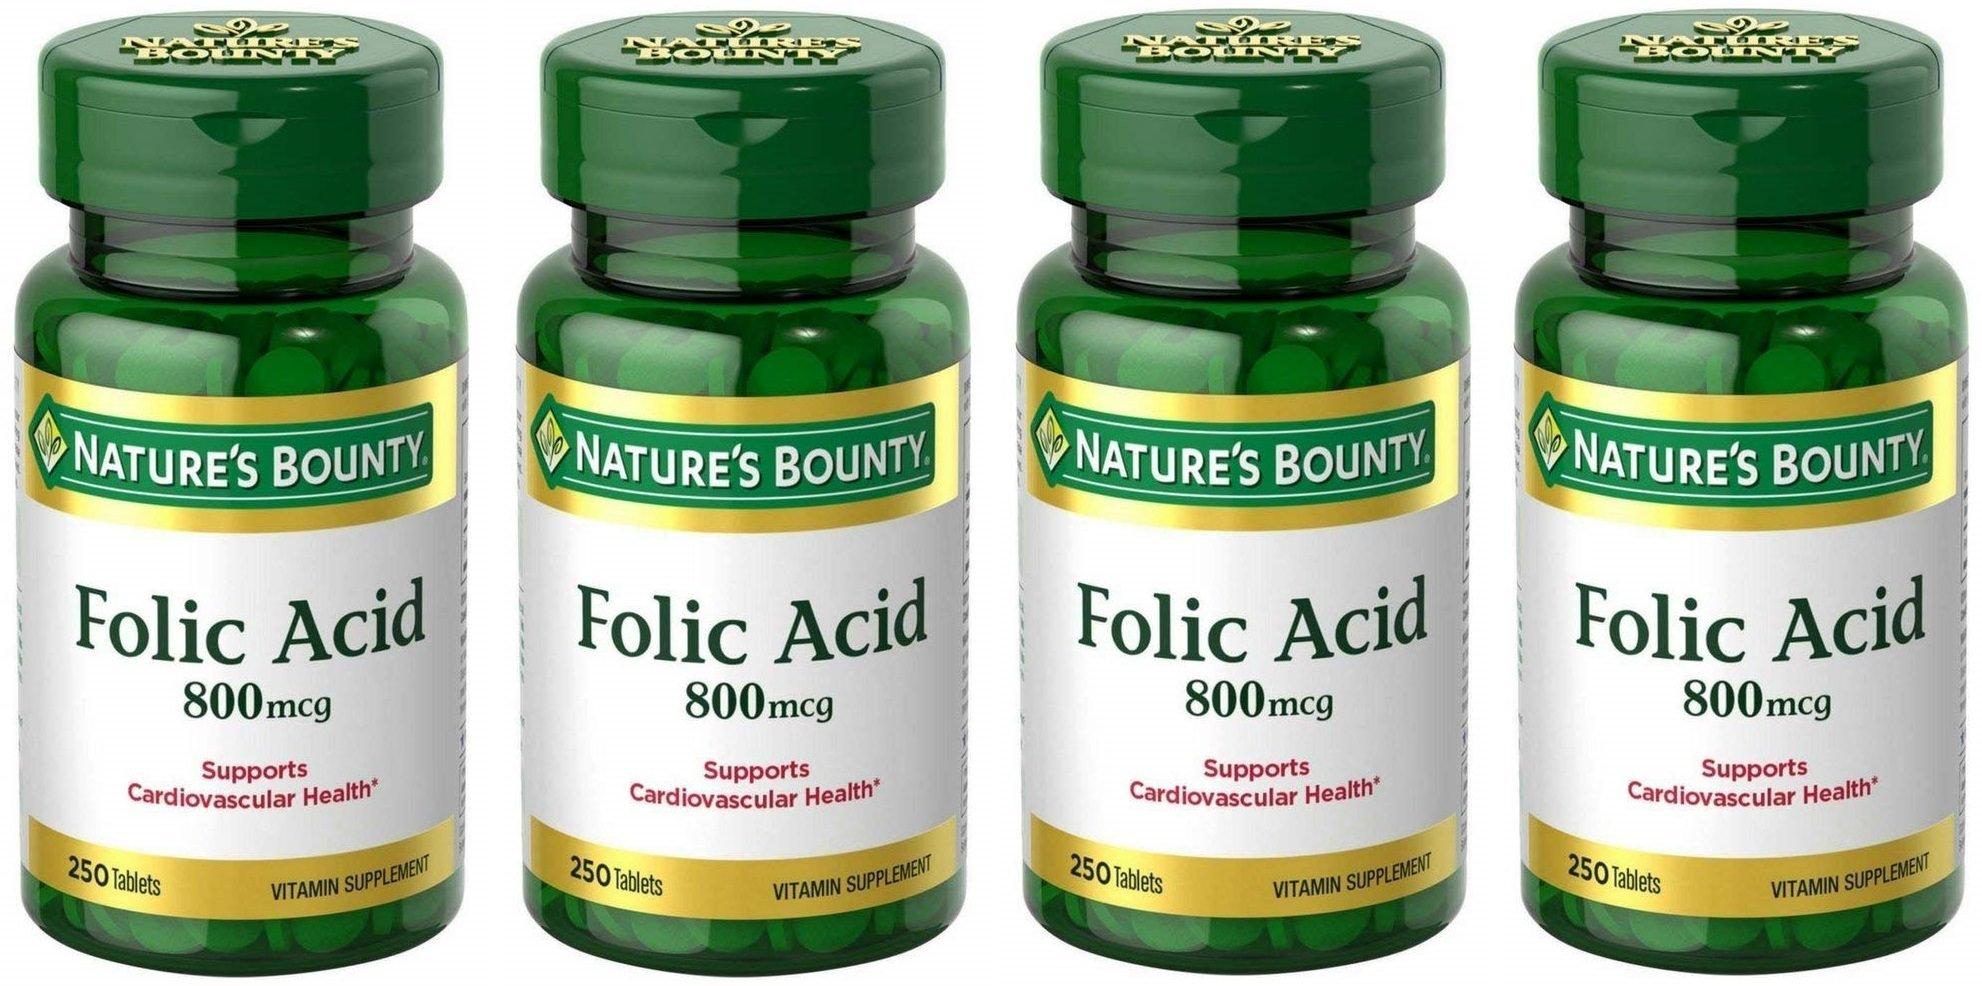 Folic Acid 800 mcg Tablets Maximum Strength, 4 Bottles (250 Count) by Nature's Bounty (Image #1)